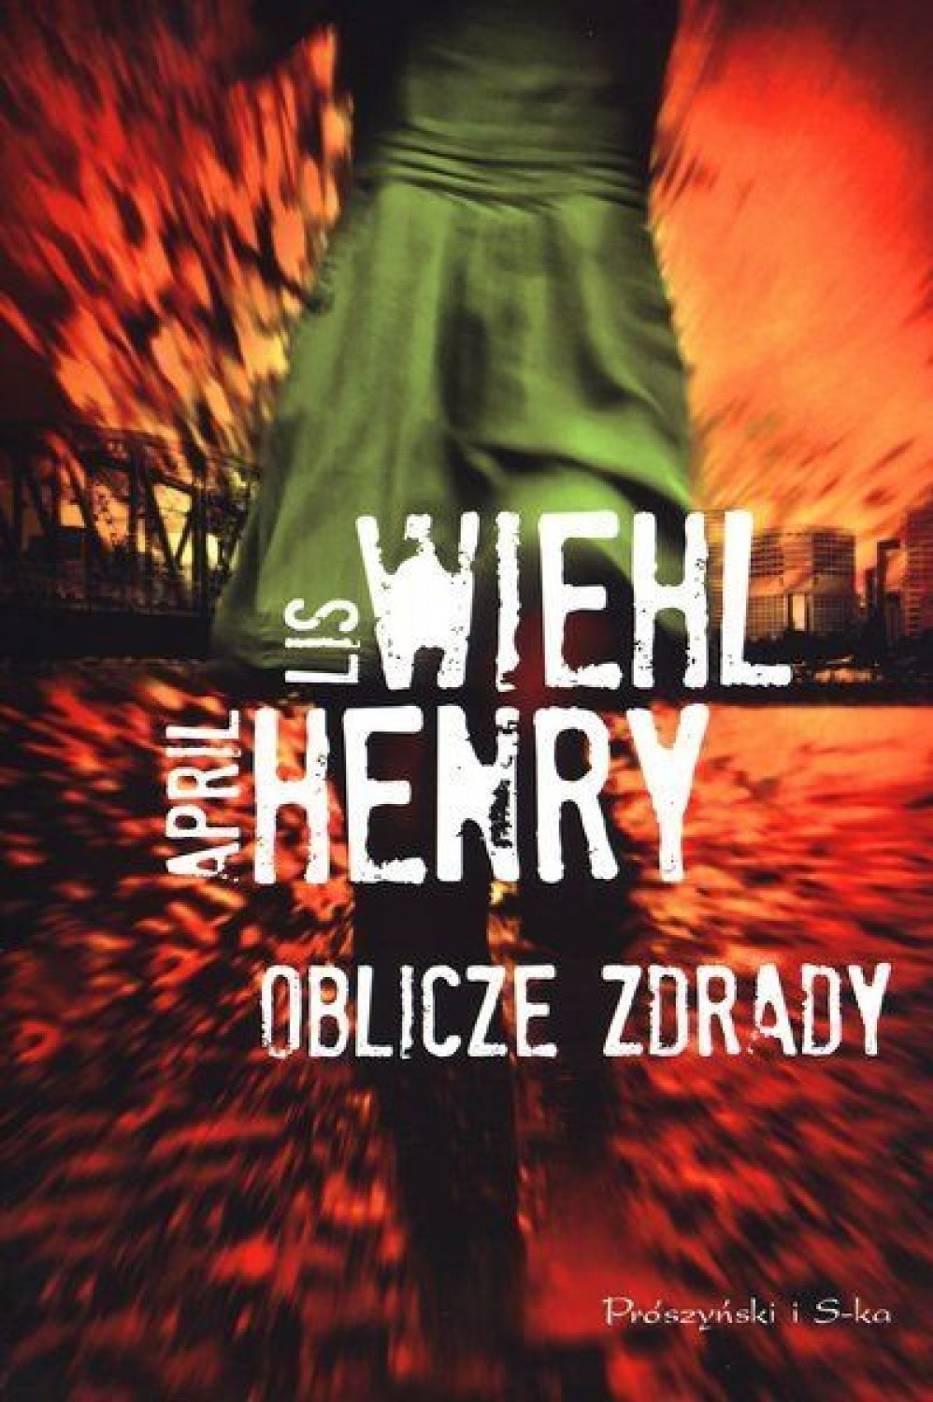 """Oblicze zdrady"" Lis Wiehl, April Henry"